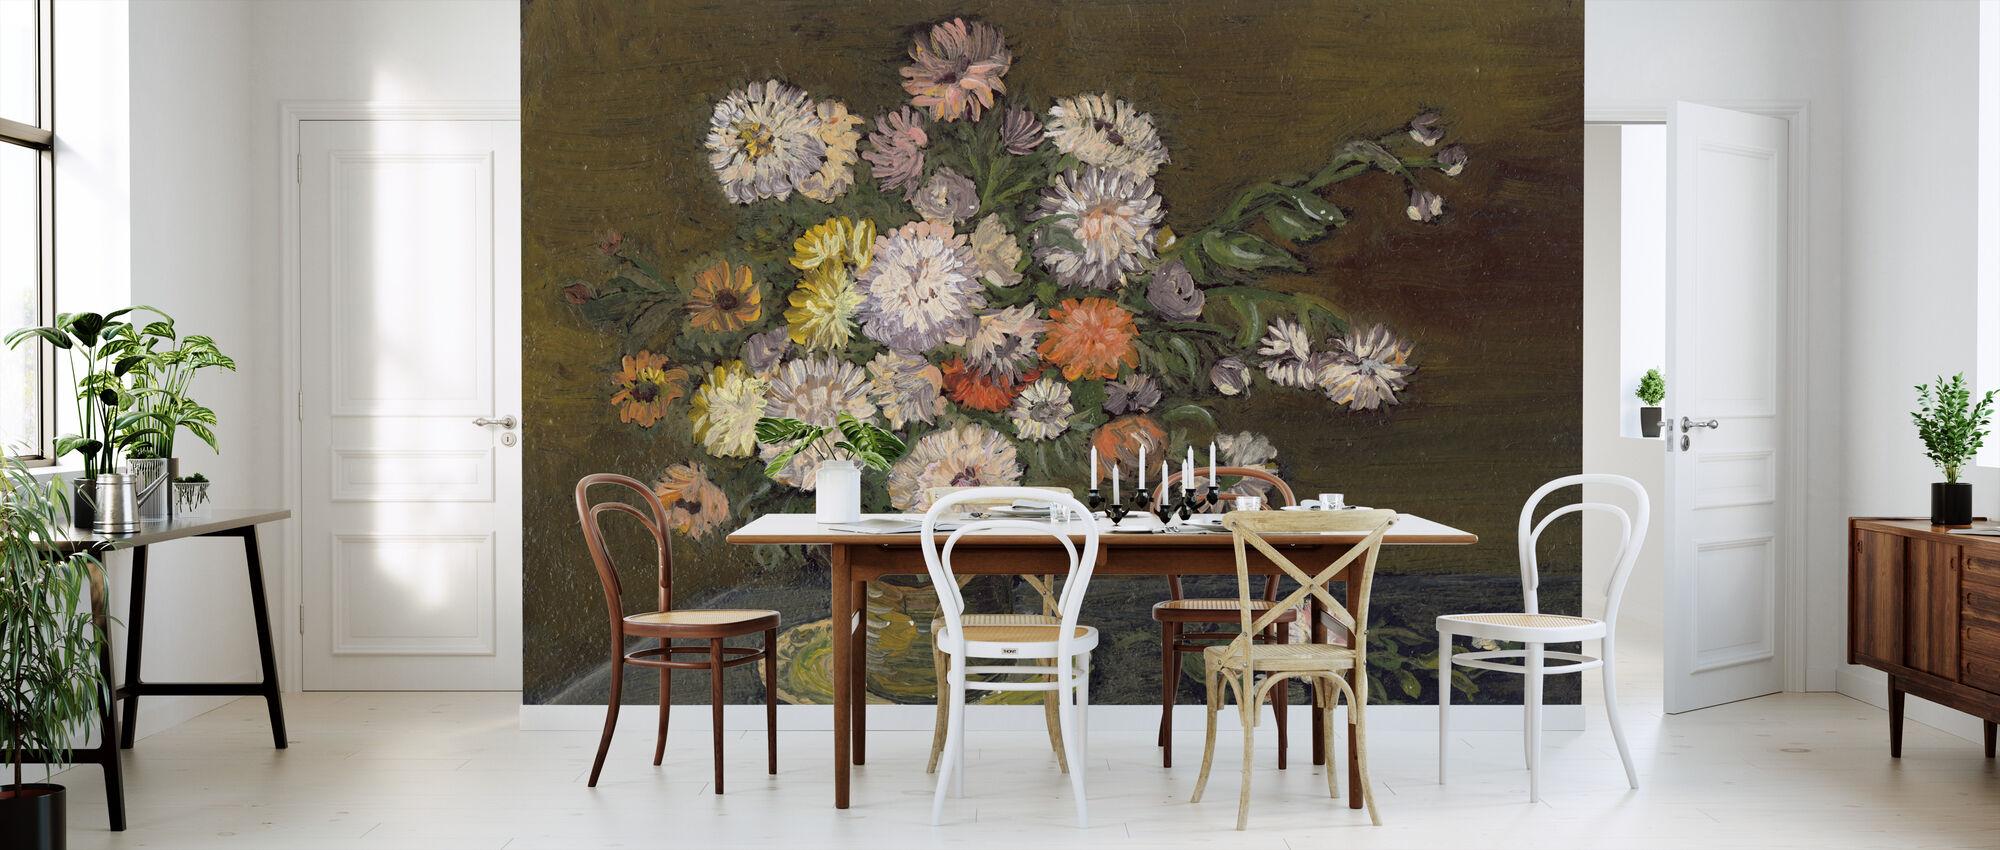 flower arrangement fototapete nach ma photowall. Black Bedroom Furniture Sets. Home Design Ideas